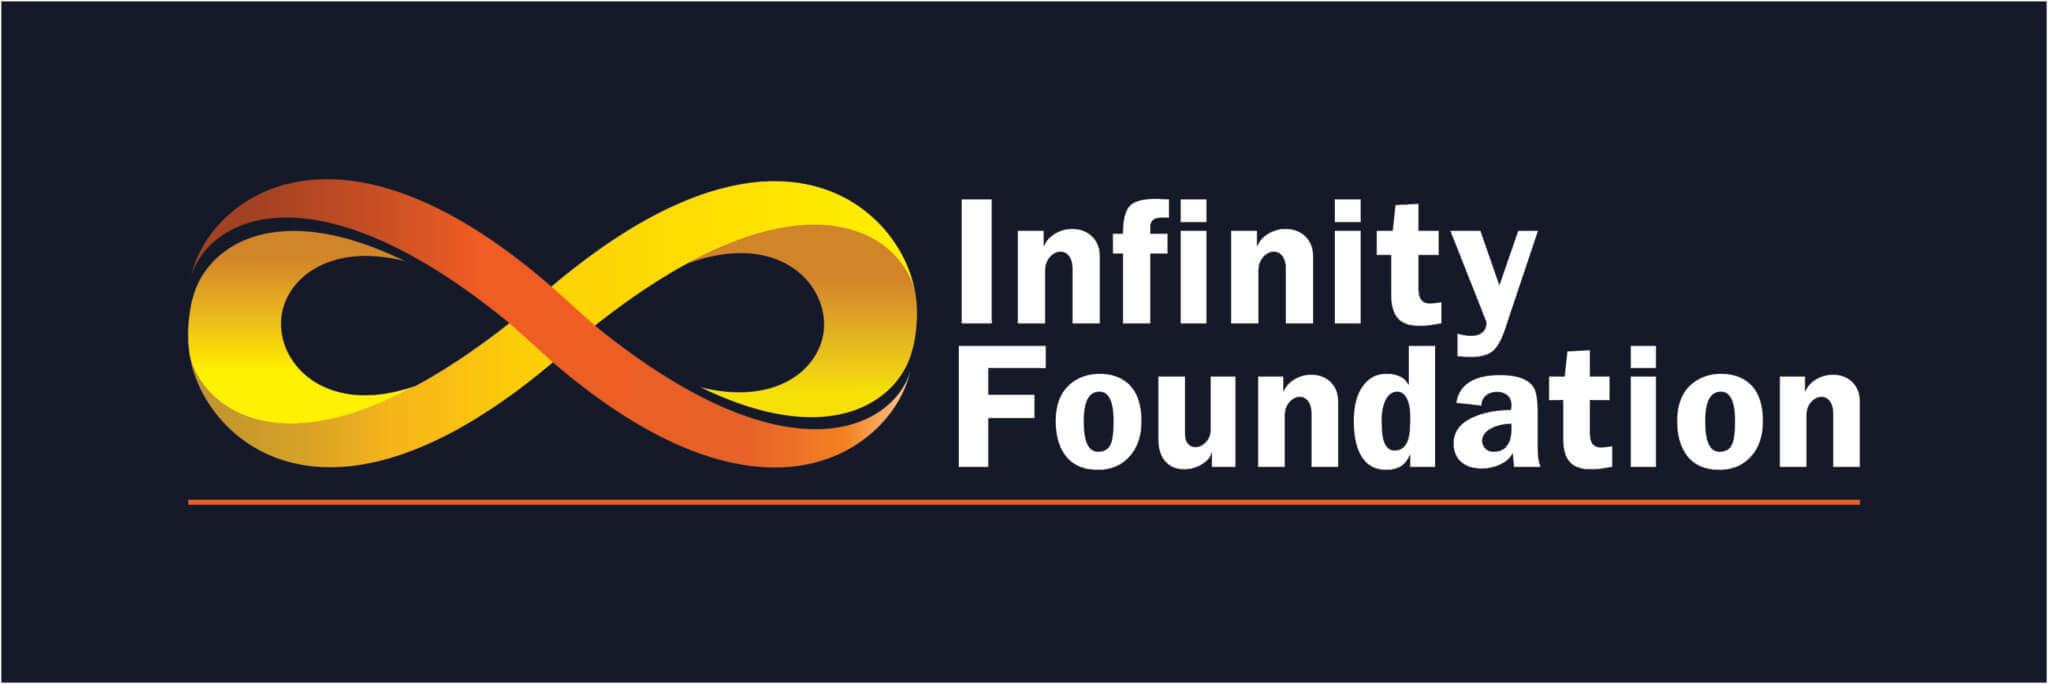 Infinity-Foundation.jpg